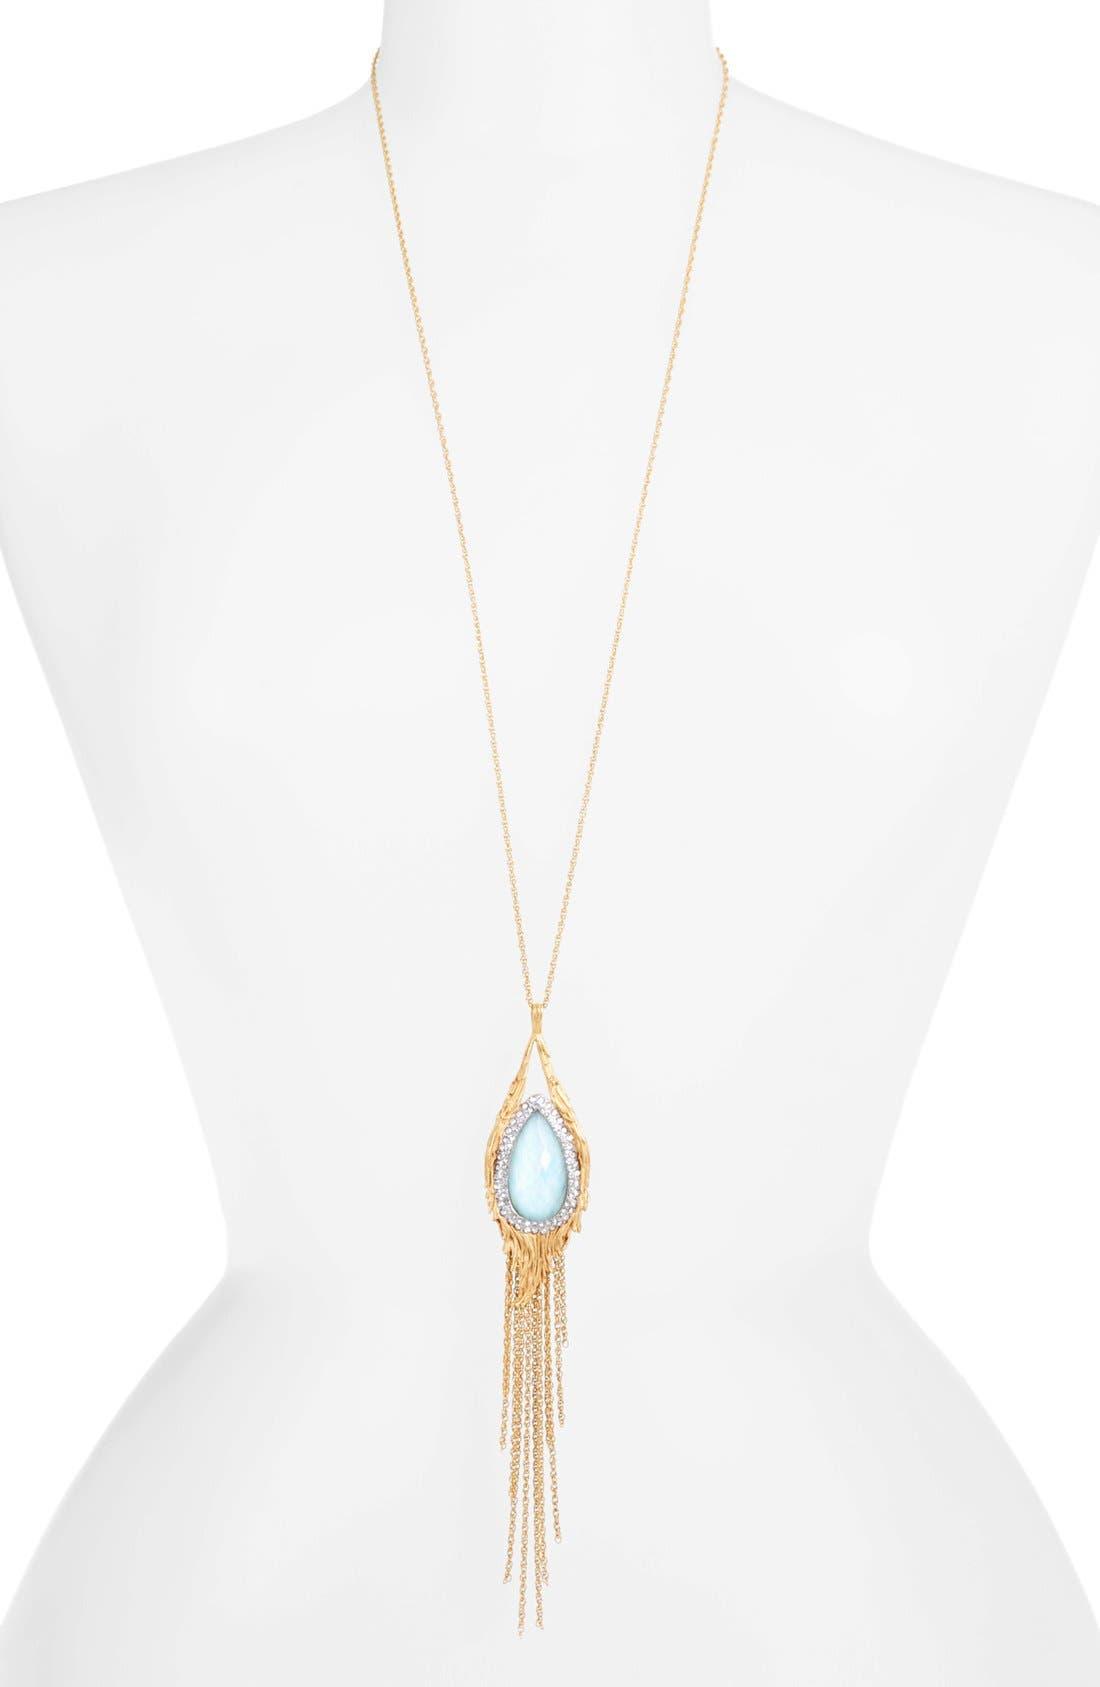 Main Image - Alexis Bittar 'Elements - Maldivian' Long Tassel Pendant Necklace